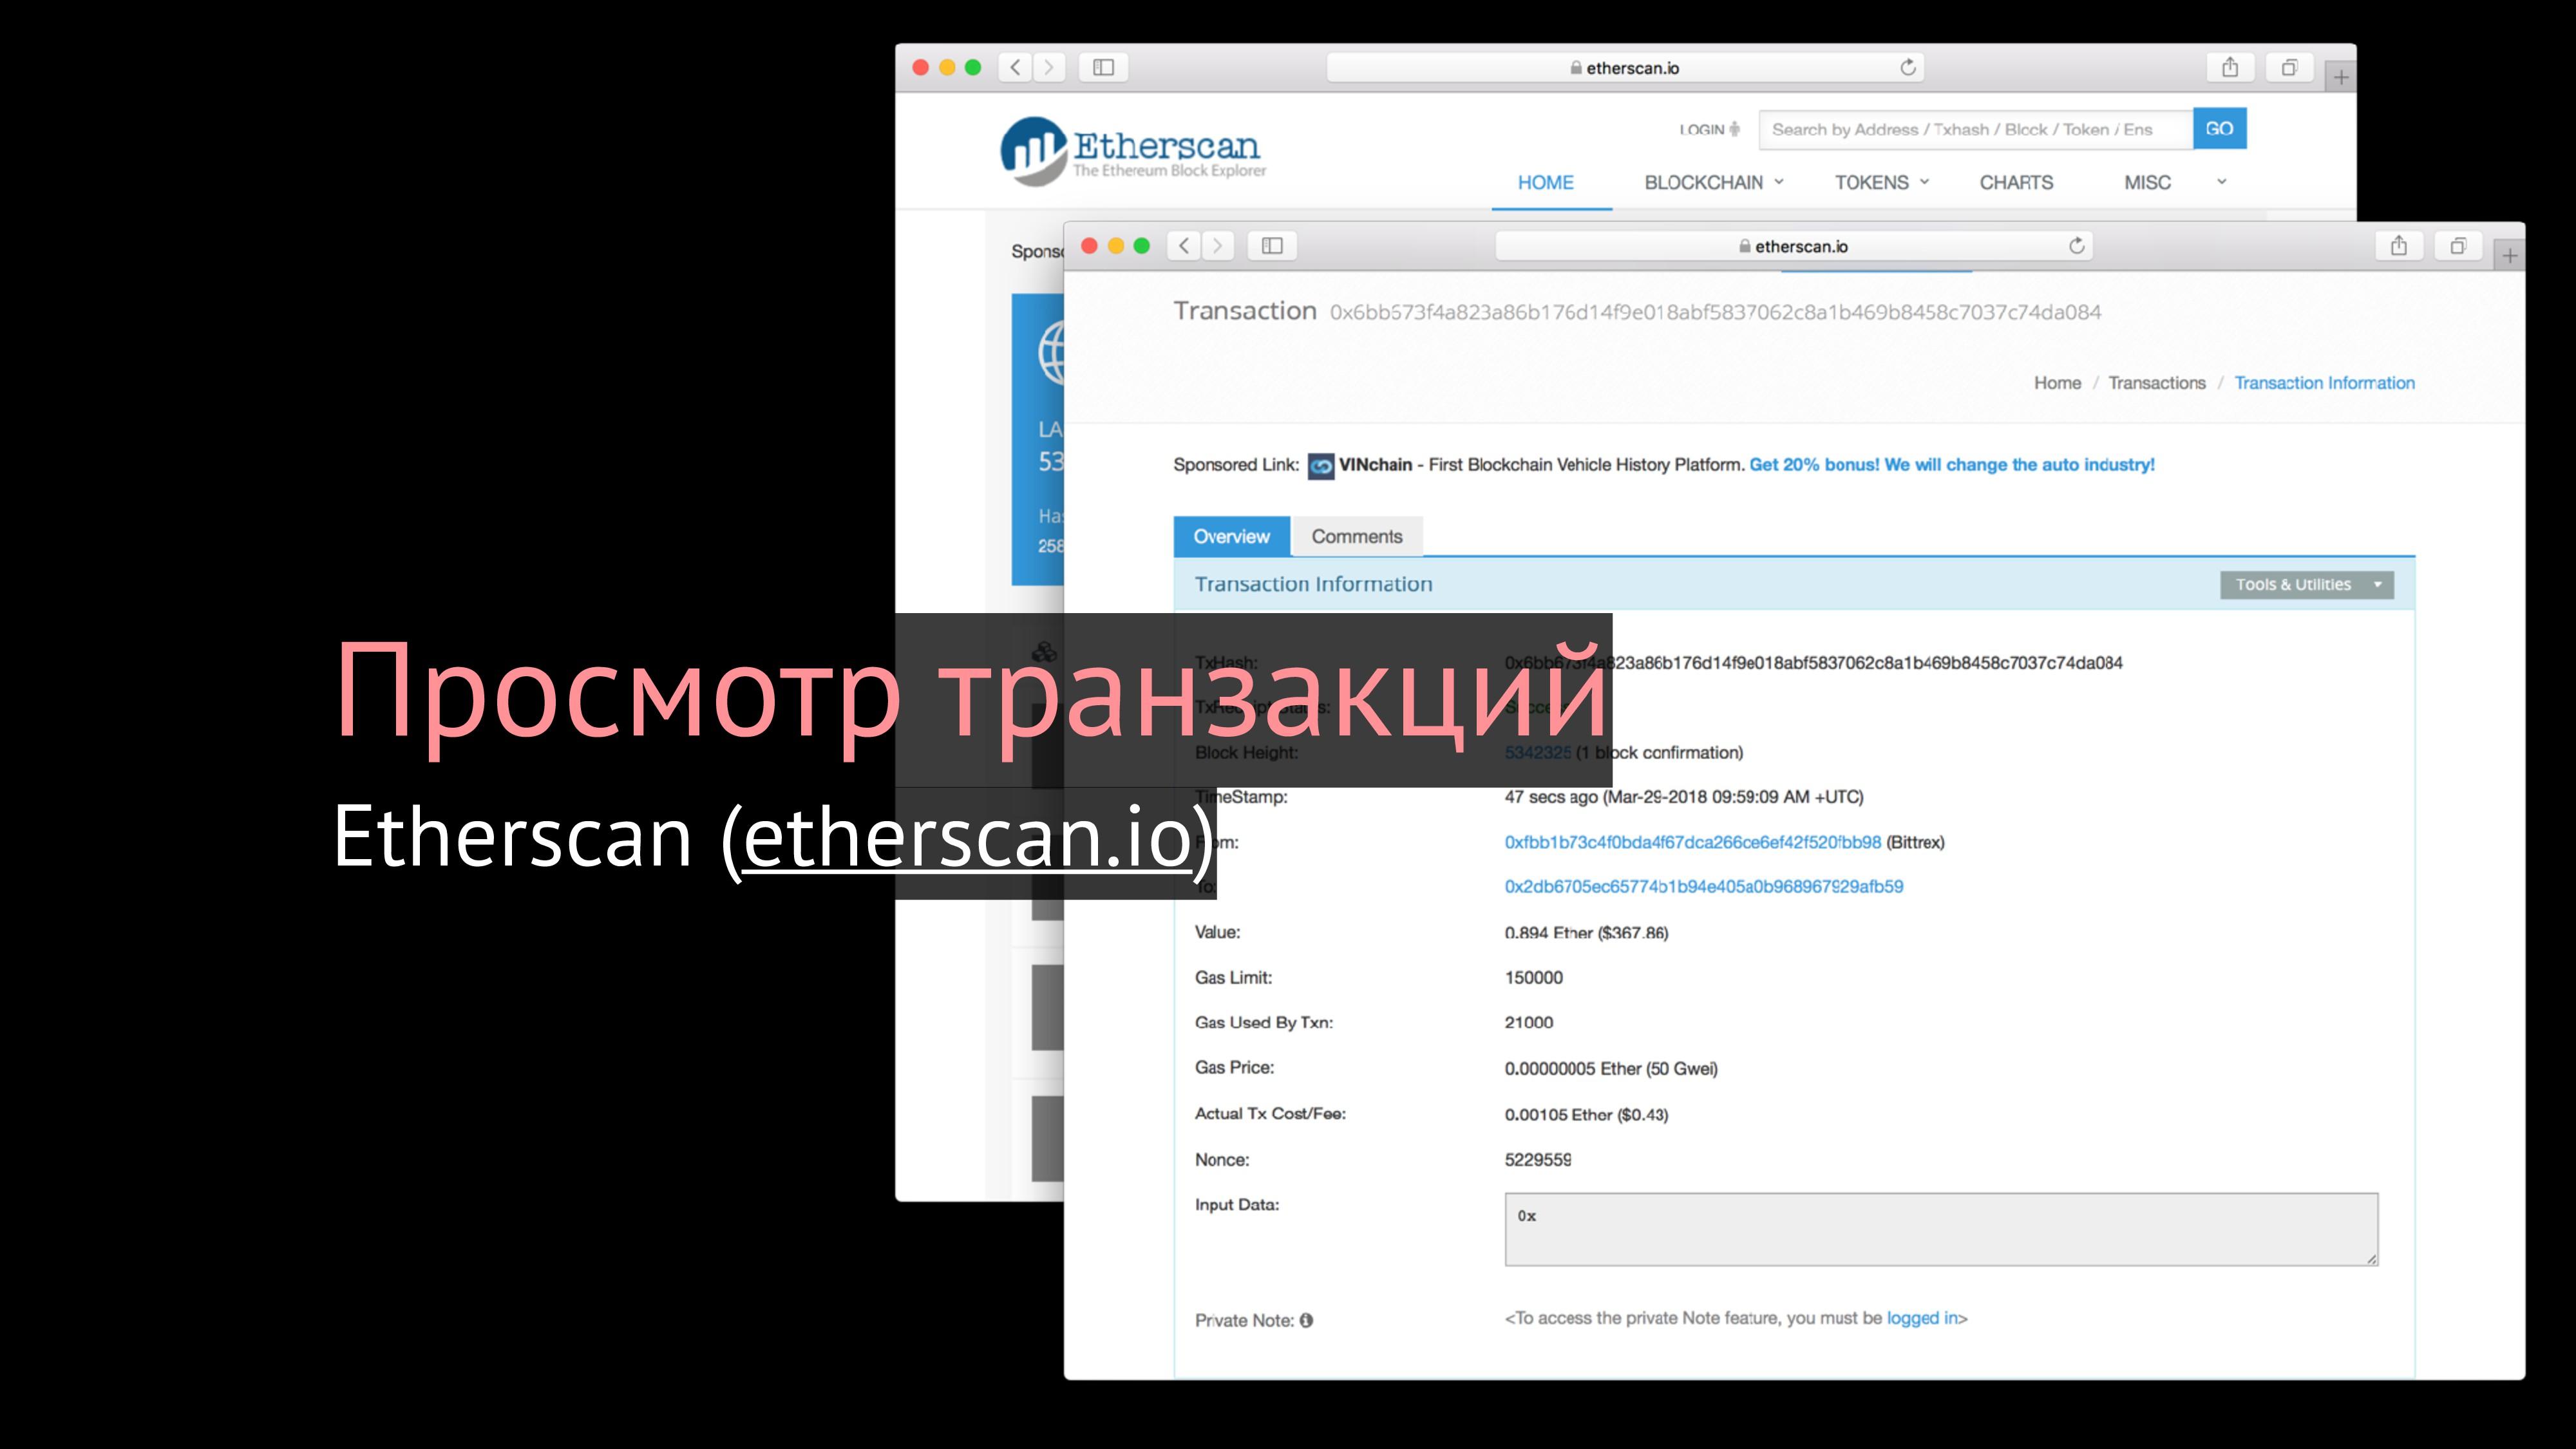 Просмотр транзакций Etherscan (etherscan.io)